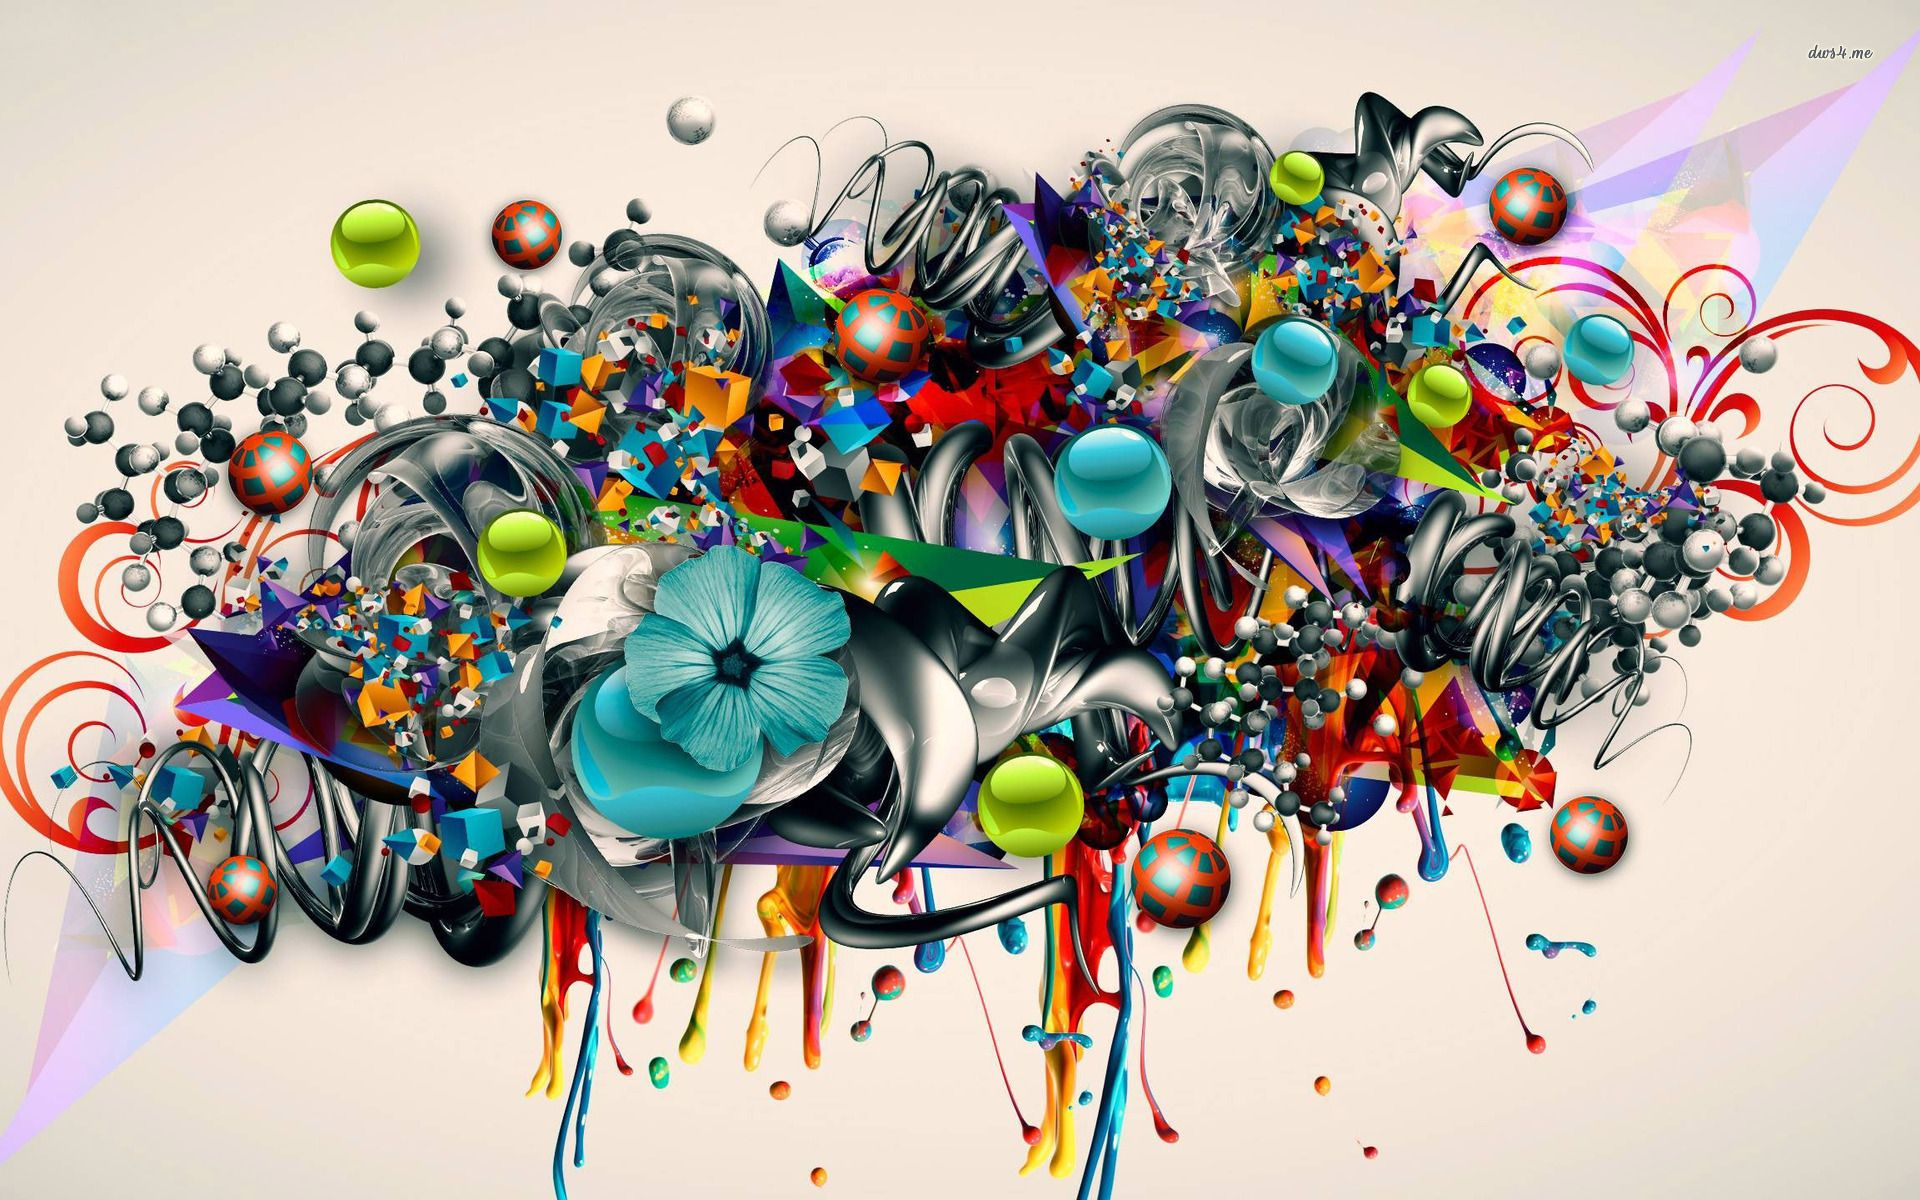 Graffiti art designs - Graffiti Design Art Hd Wallpaper For Pc